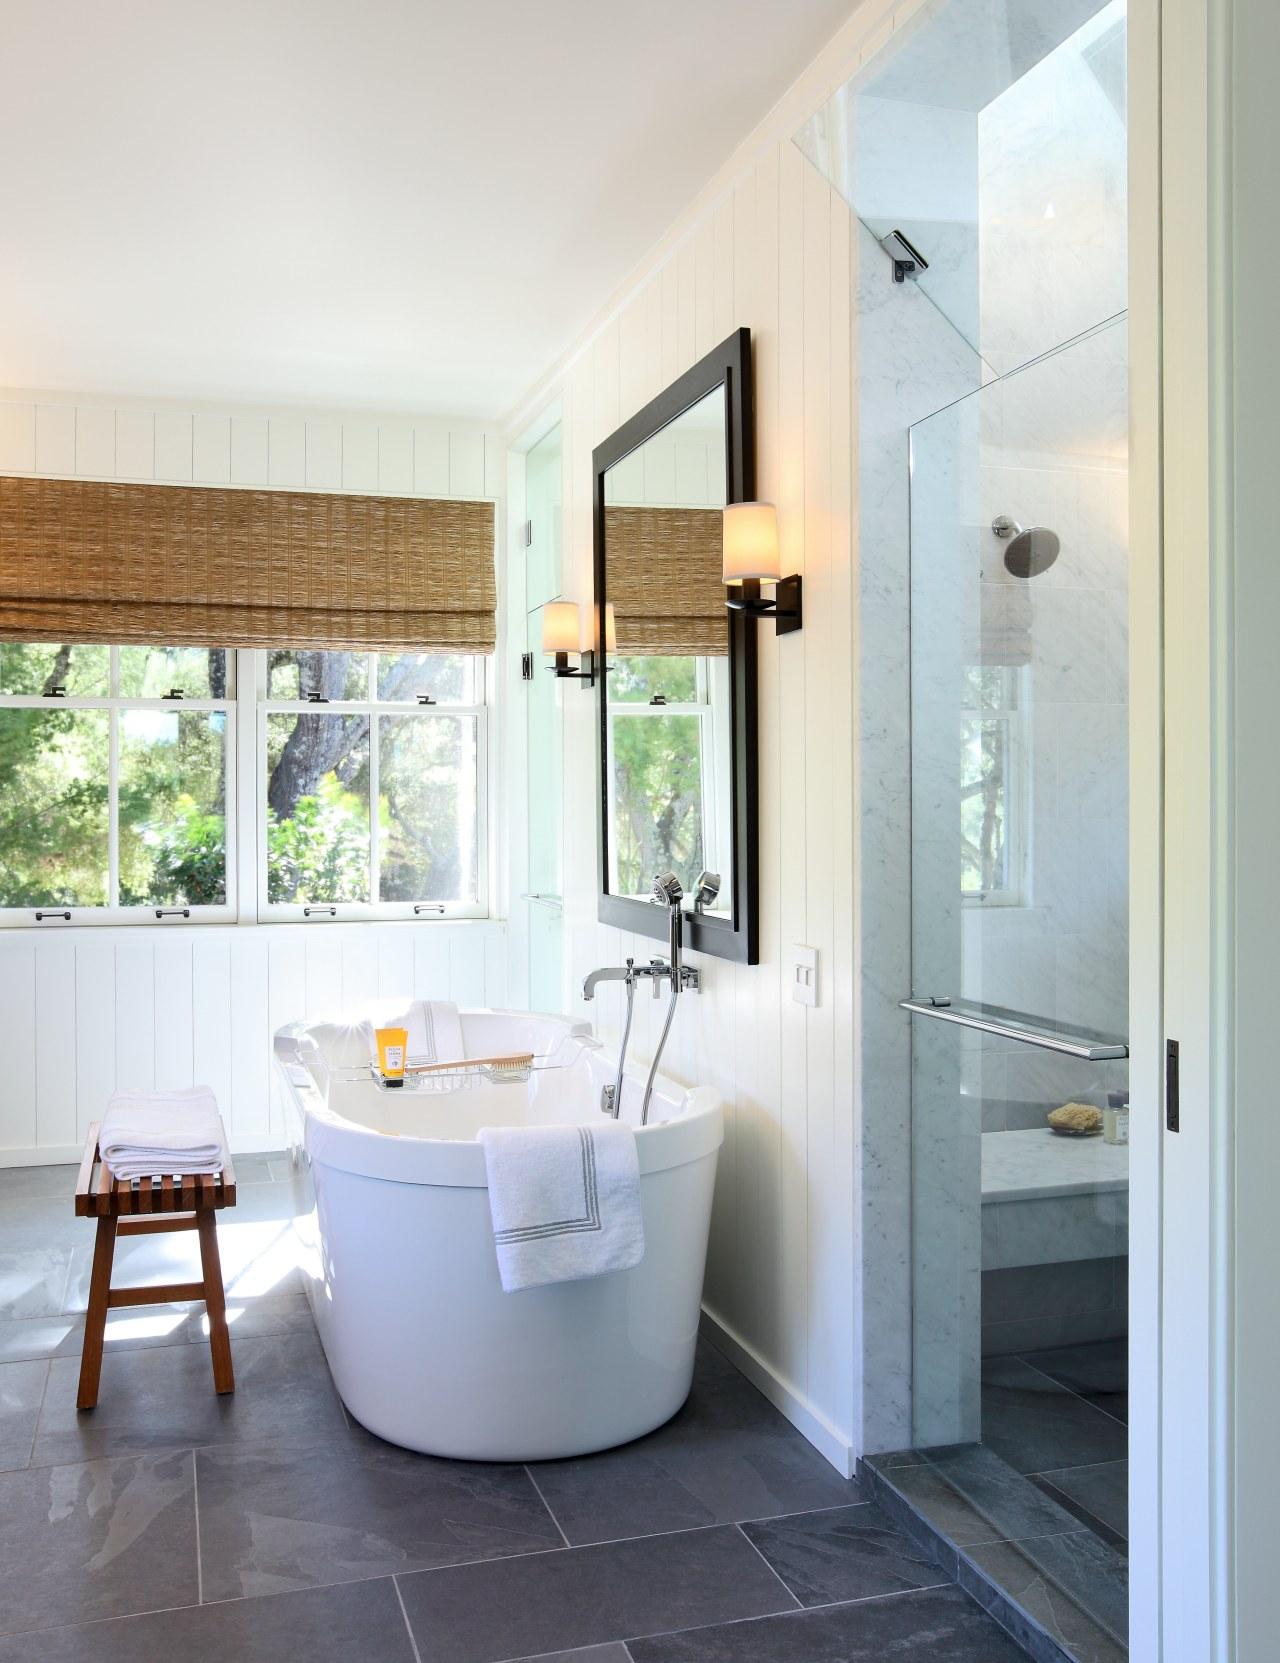 Bathroom with grey tiled flooring and white tub. bathroom, floor, home, interior design, plumbing fixture, real estate, room, window, white